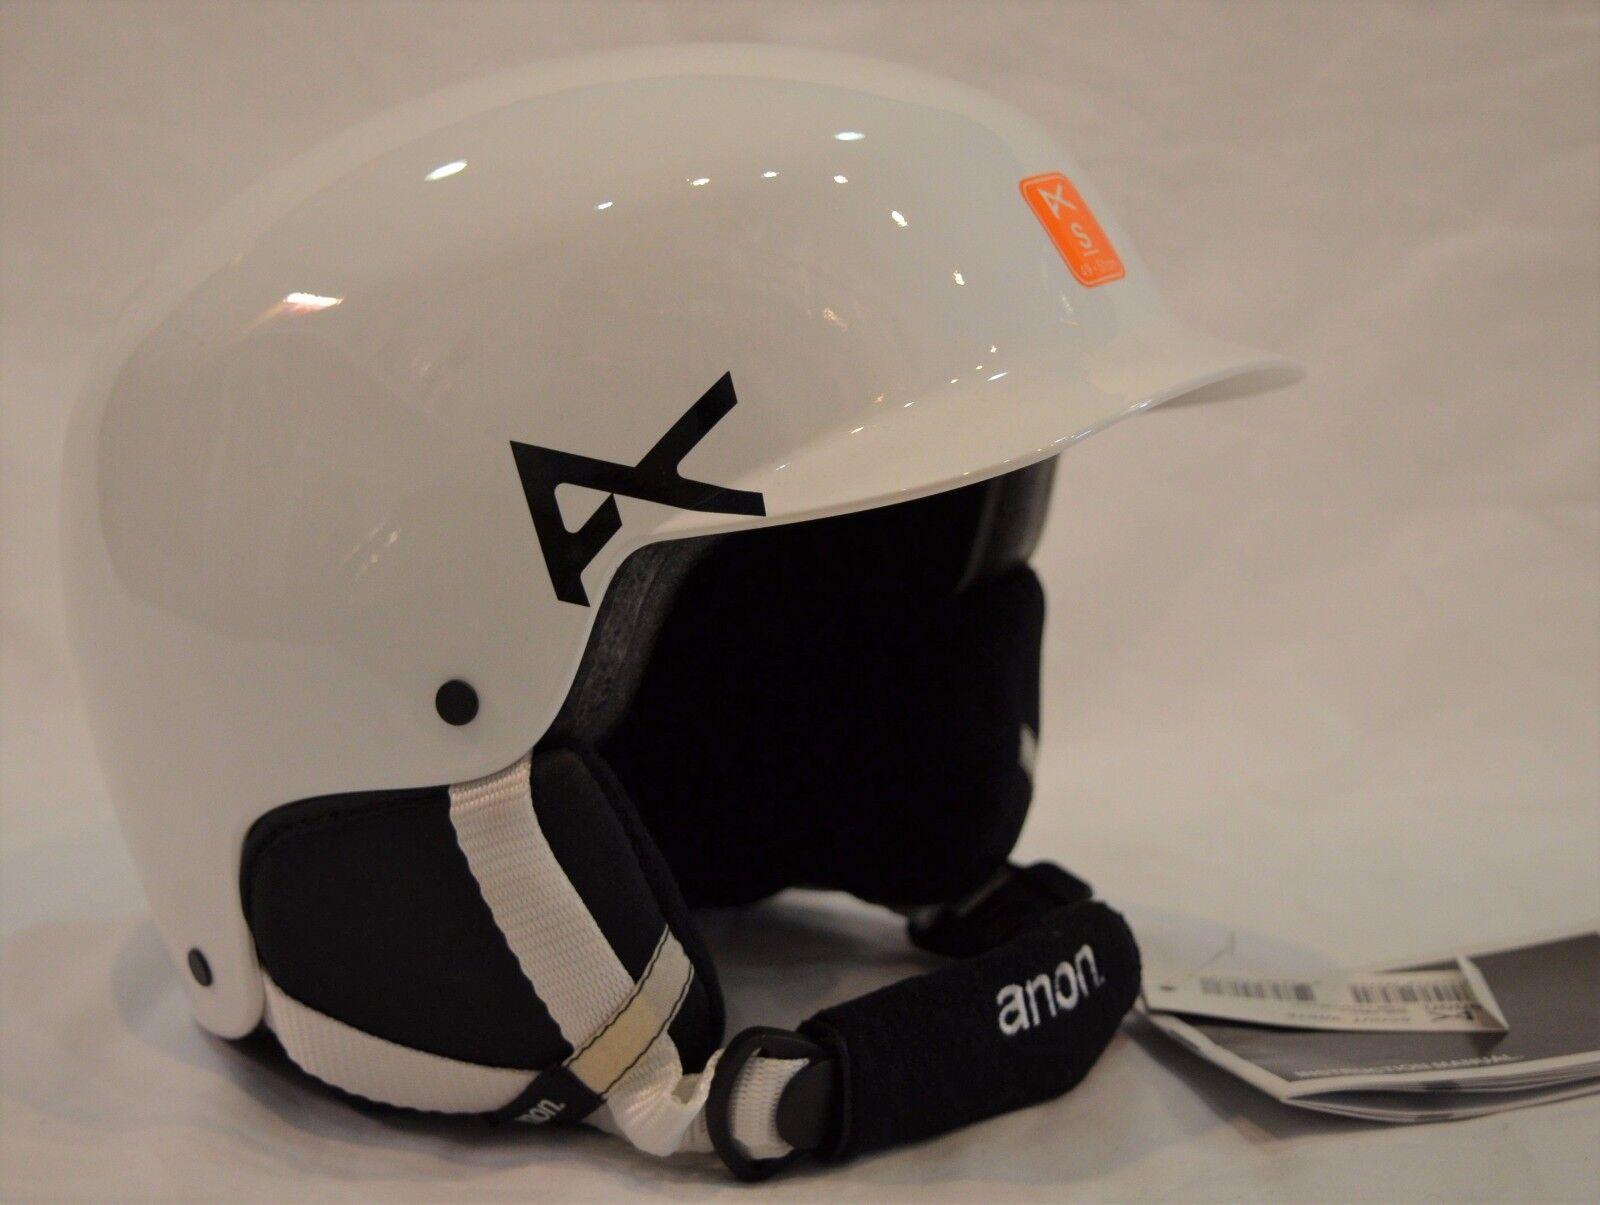 Youth  Unisex Burton ANON Scout Helmet Ski Snowboard Helmet WHITE Size SMALL  brand on sale clearance